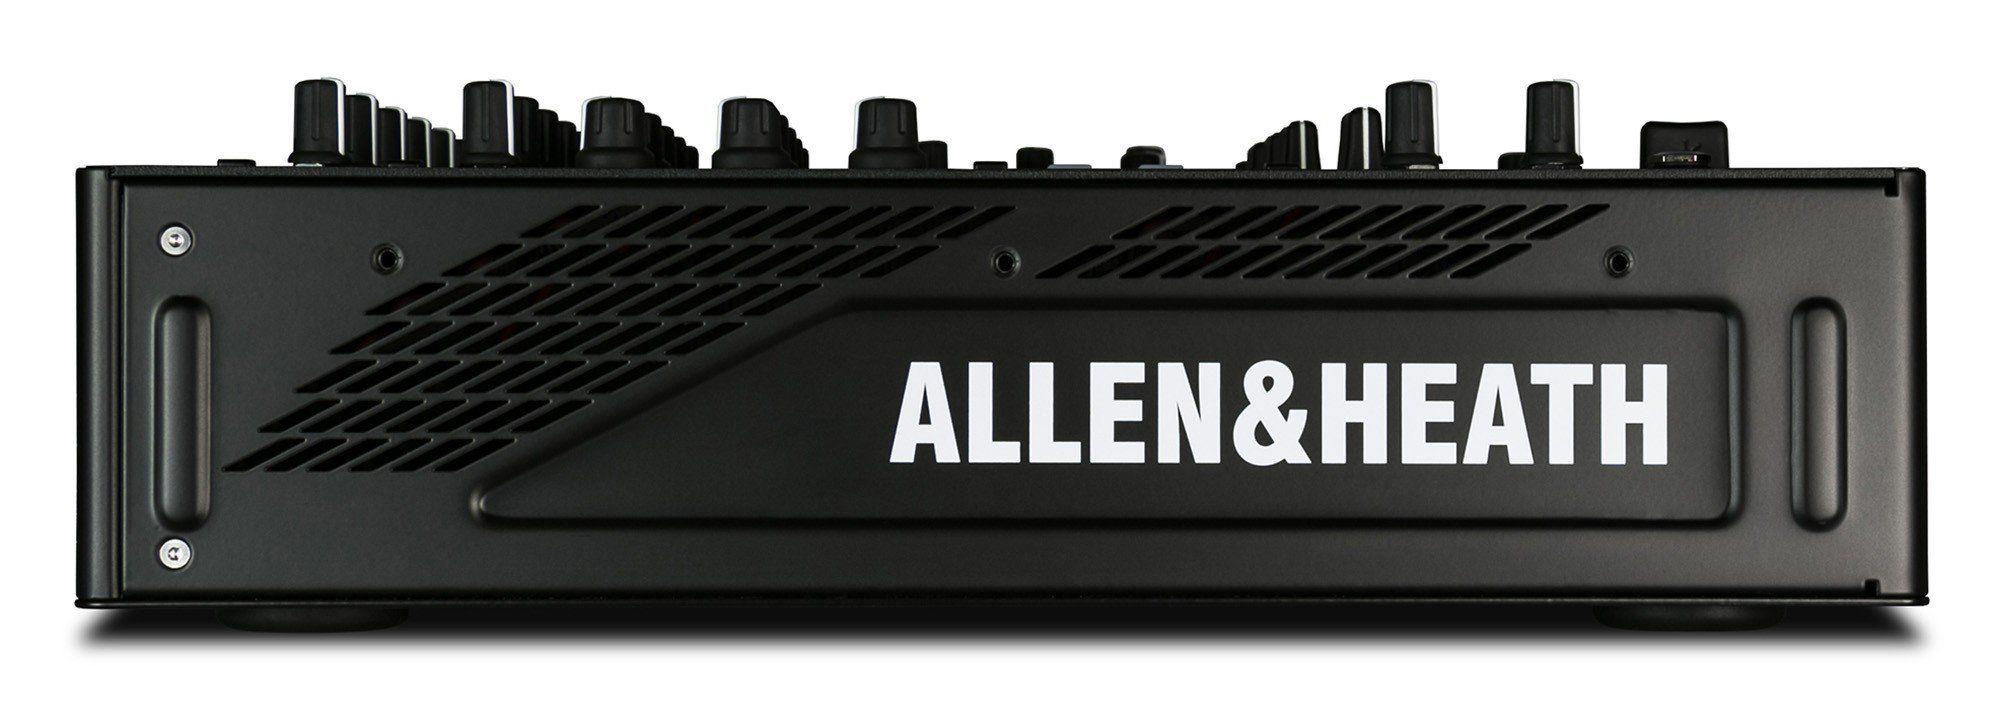 Allen Heath Xone PX5 Mixer Allen Heath Xone-PX5 com 4 canais e Traktor DVS